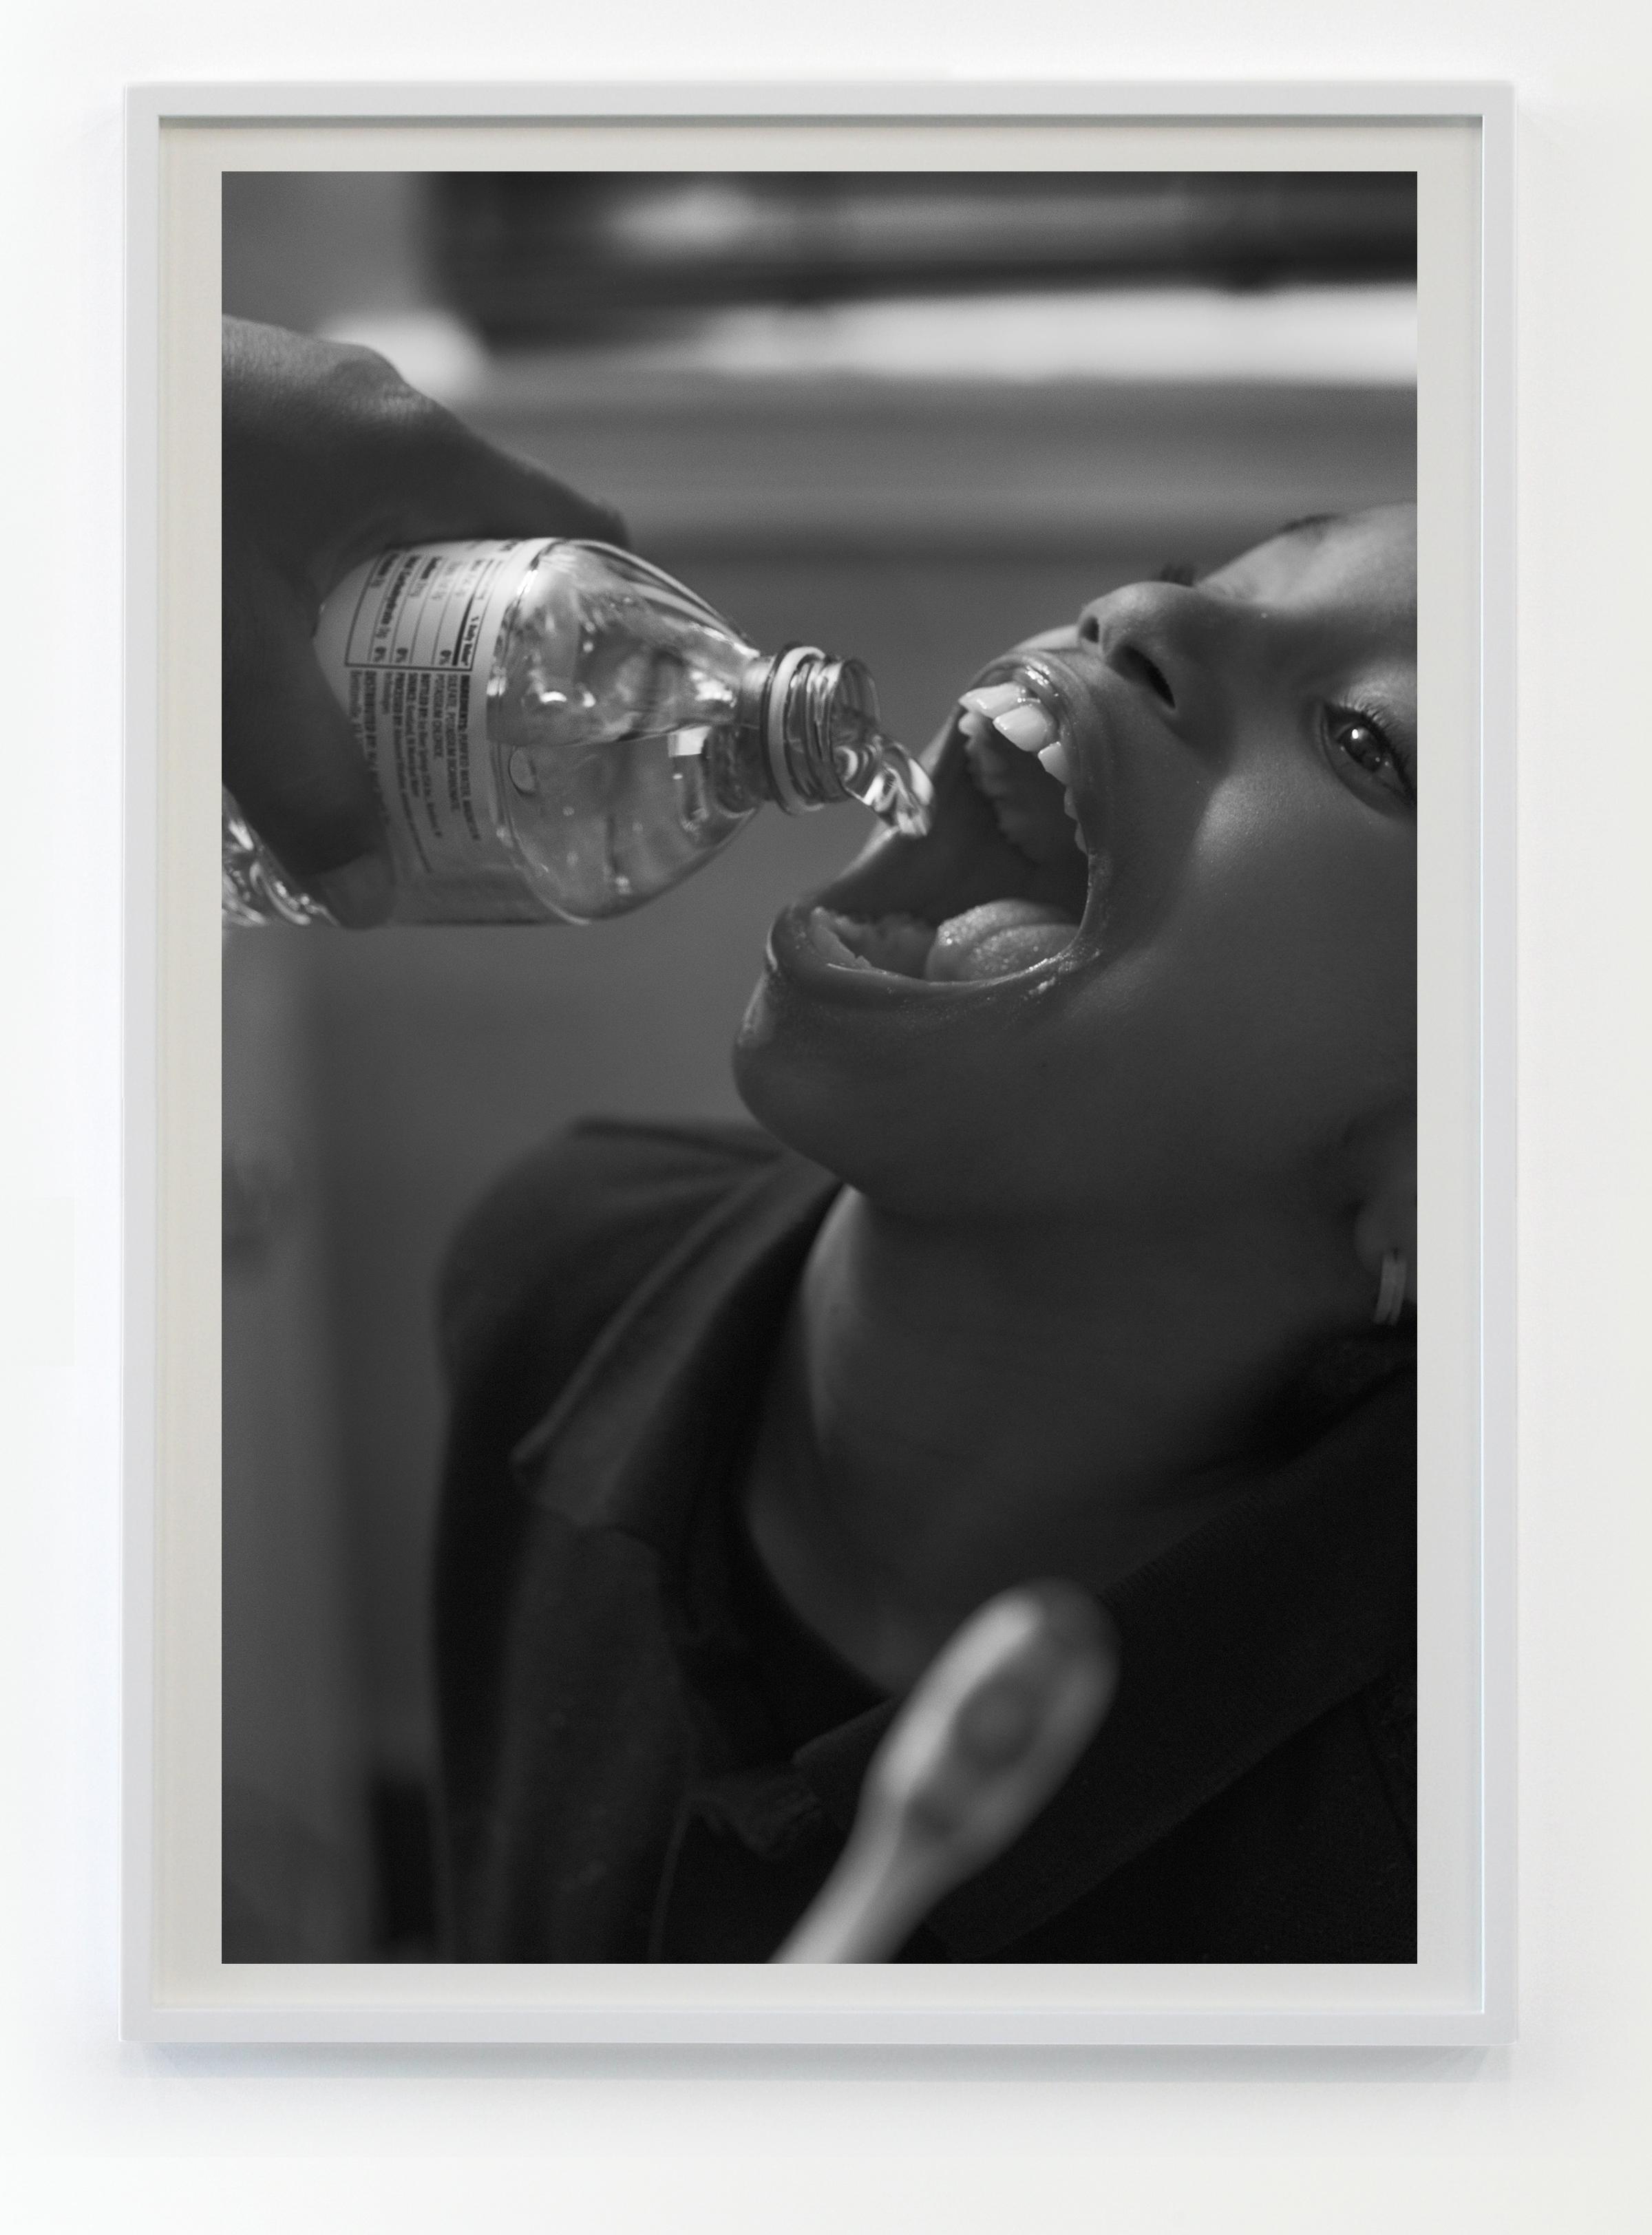 Shea Brushing Zion's teeth with bottled water in her bathroom, 2016/2017 © Latoya Ruby Frazier